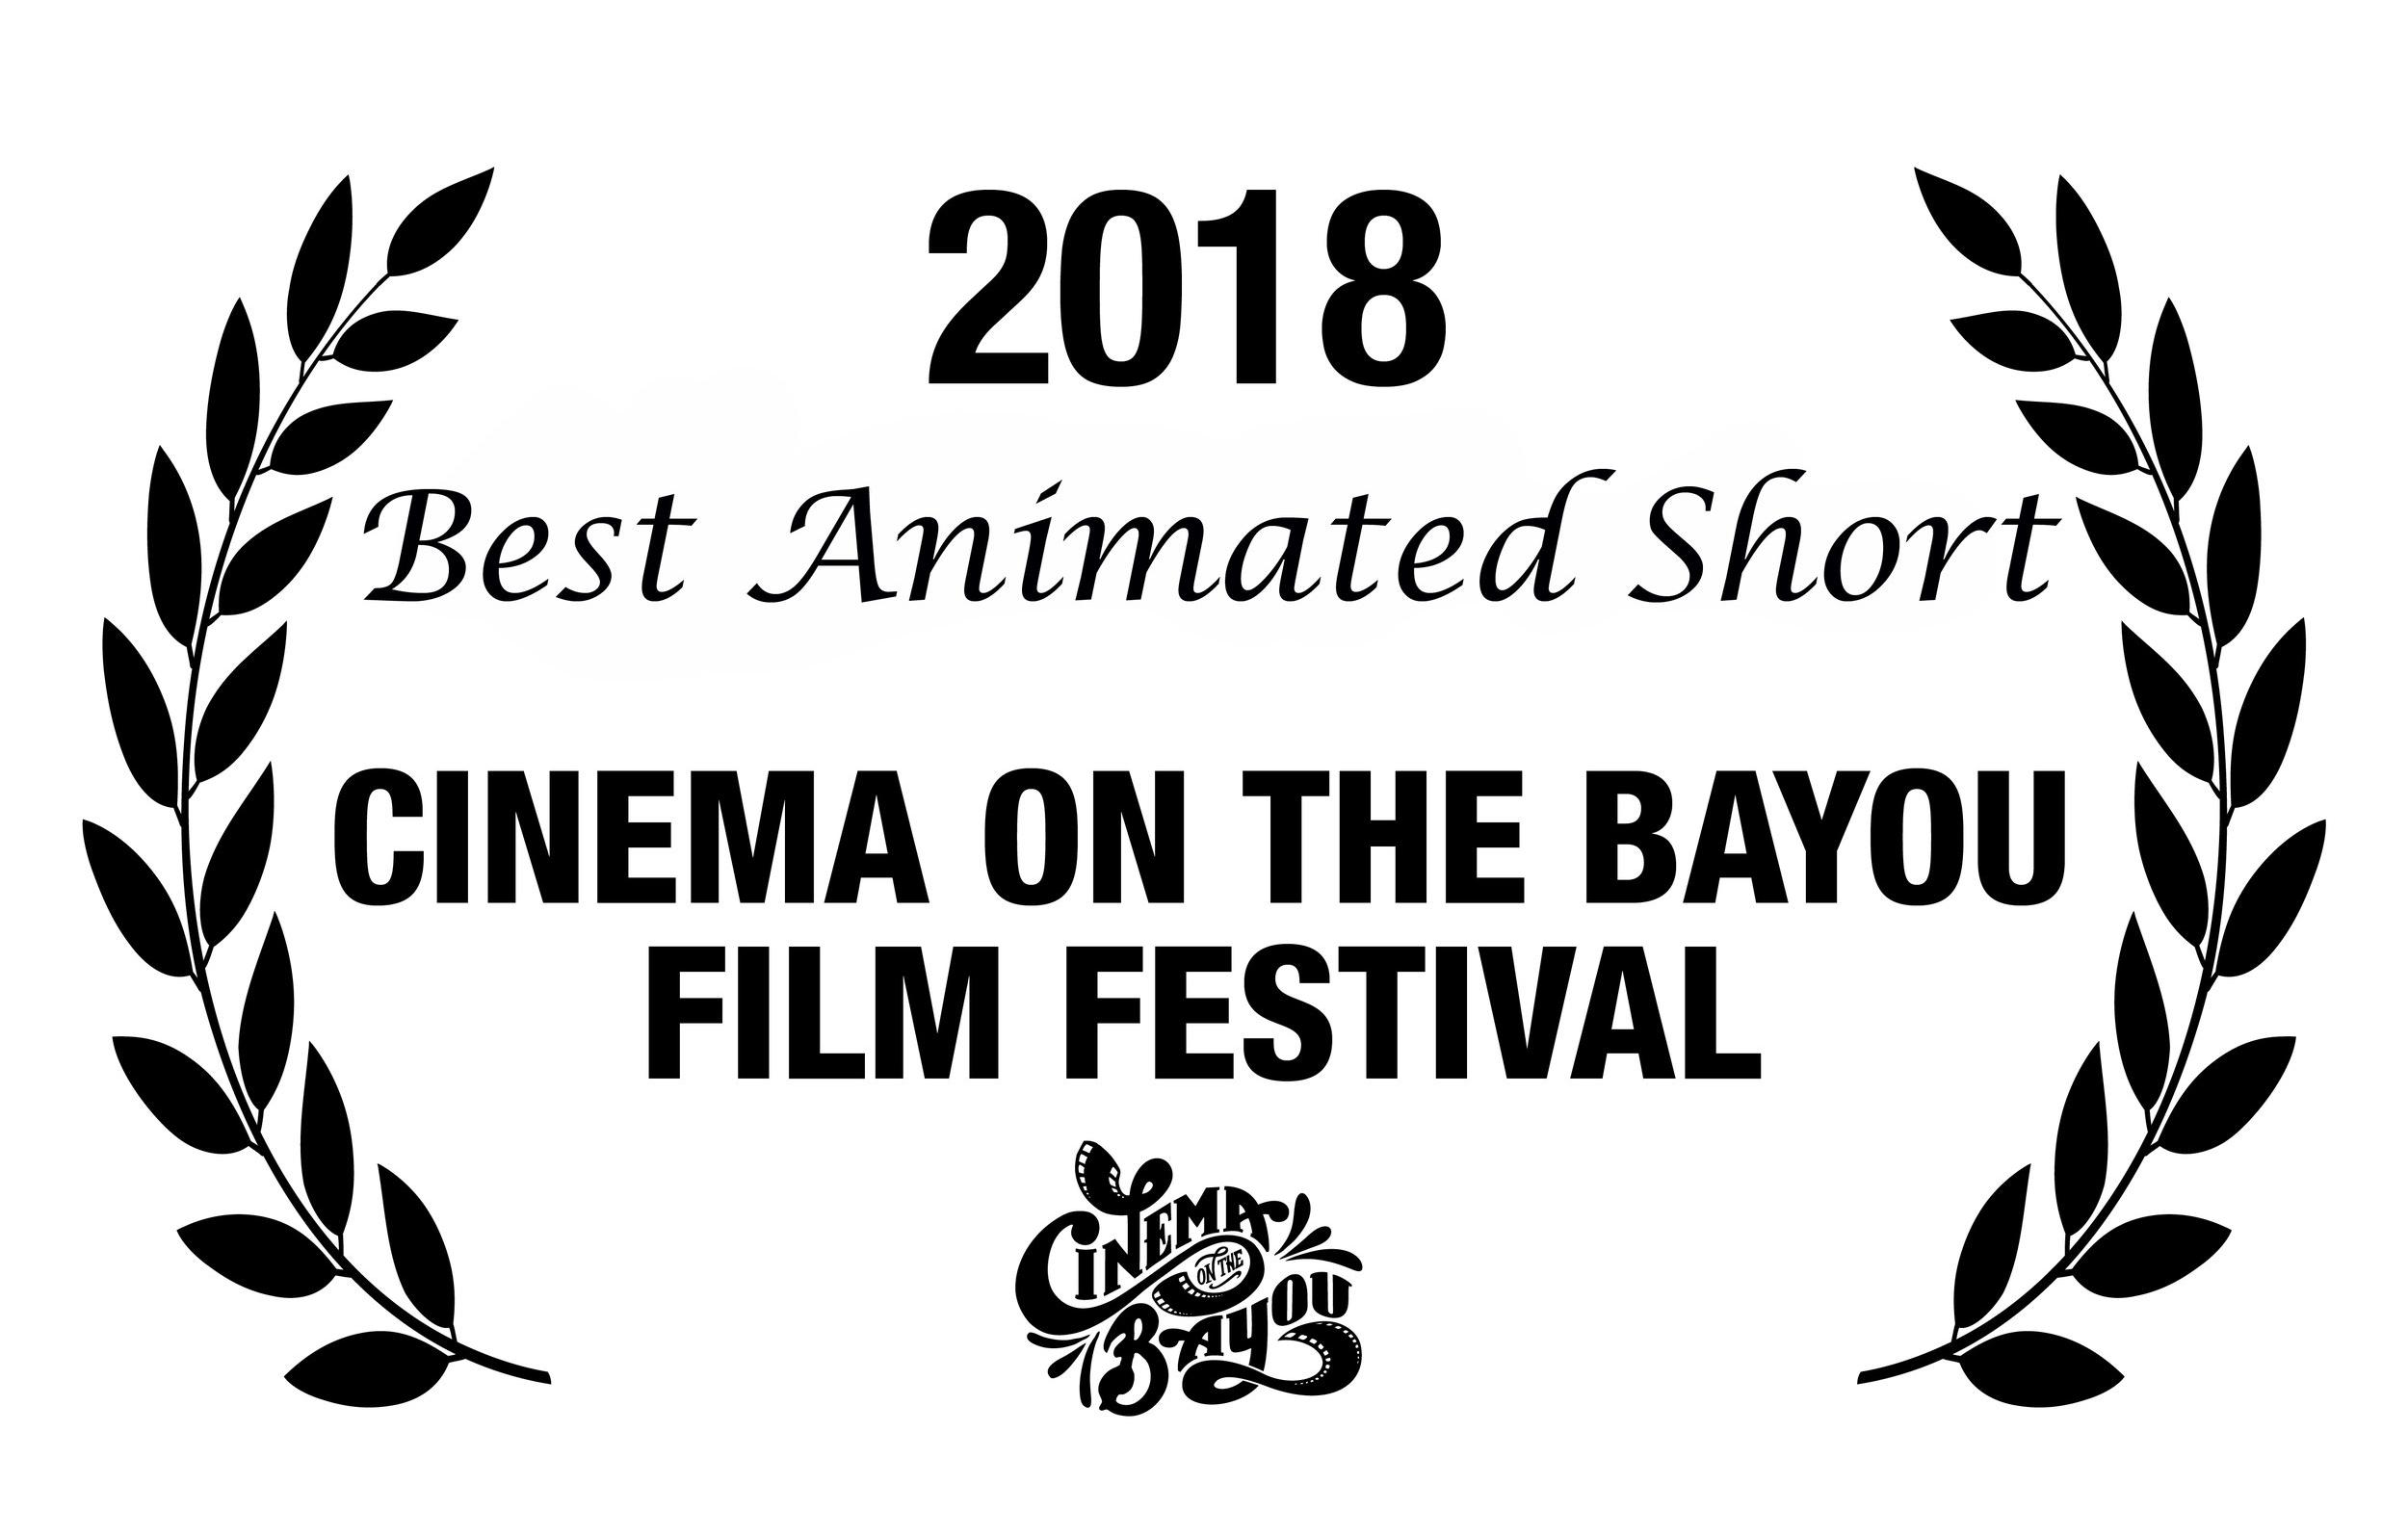 COTB_best animated short Laurels 2018 .jpg